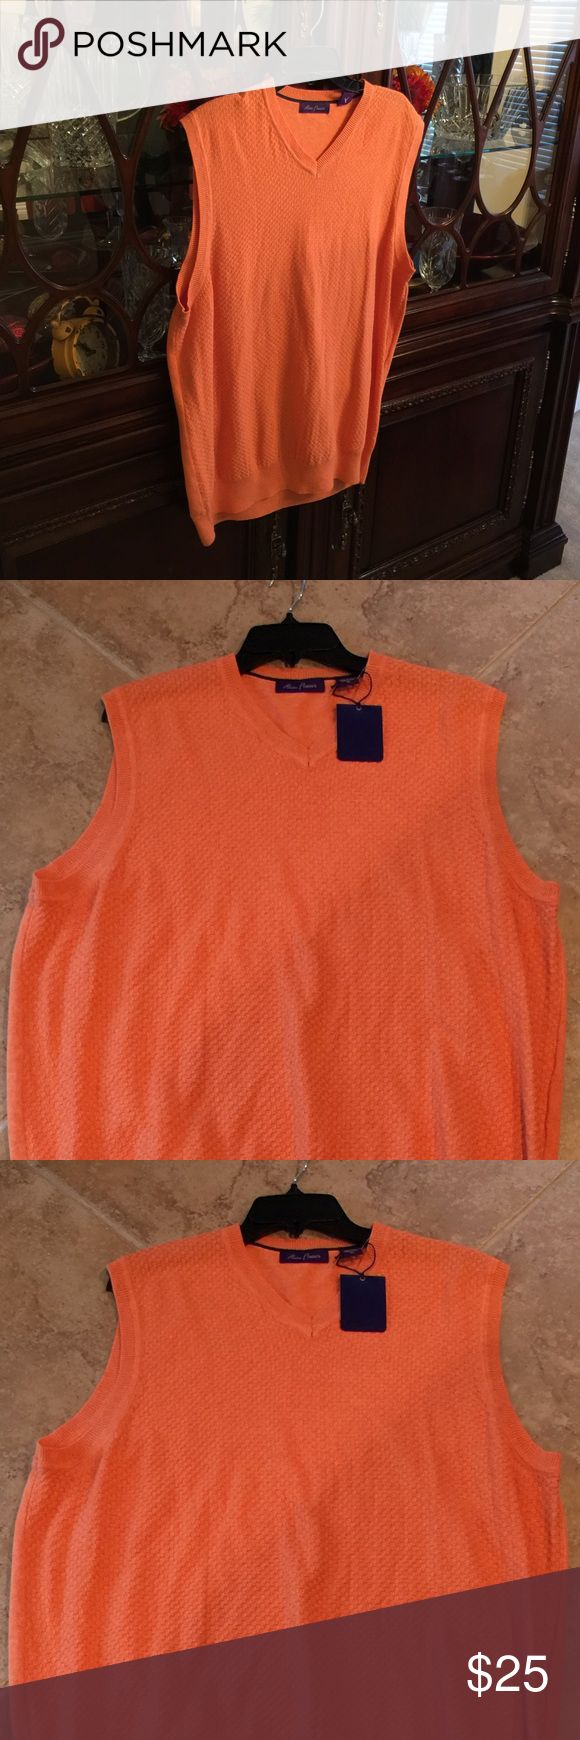 Alan Flusser Men's Orange Sweater Vest Size XL Quality at its Best! Great for Work or Play Alan Flusser Other